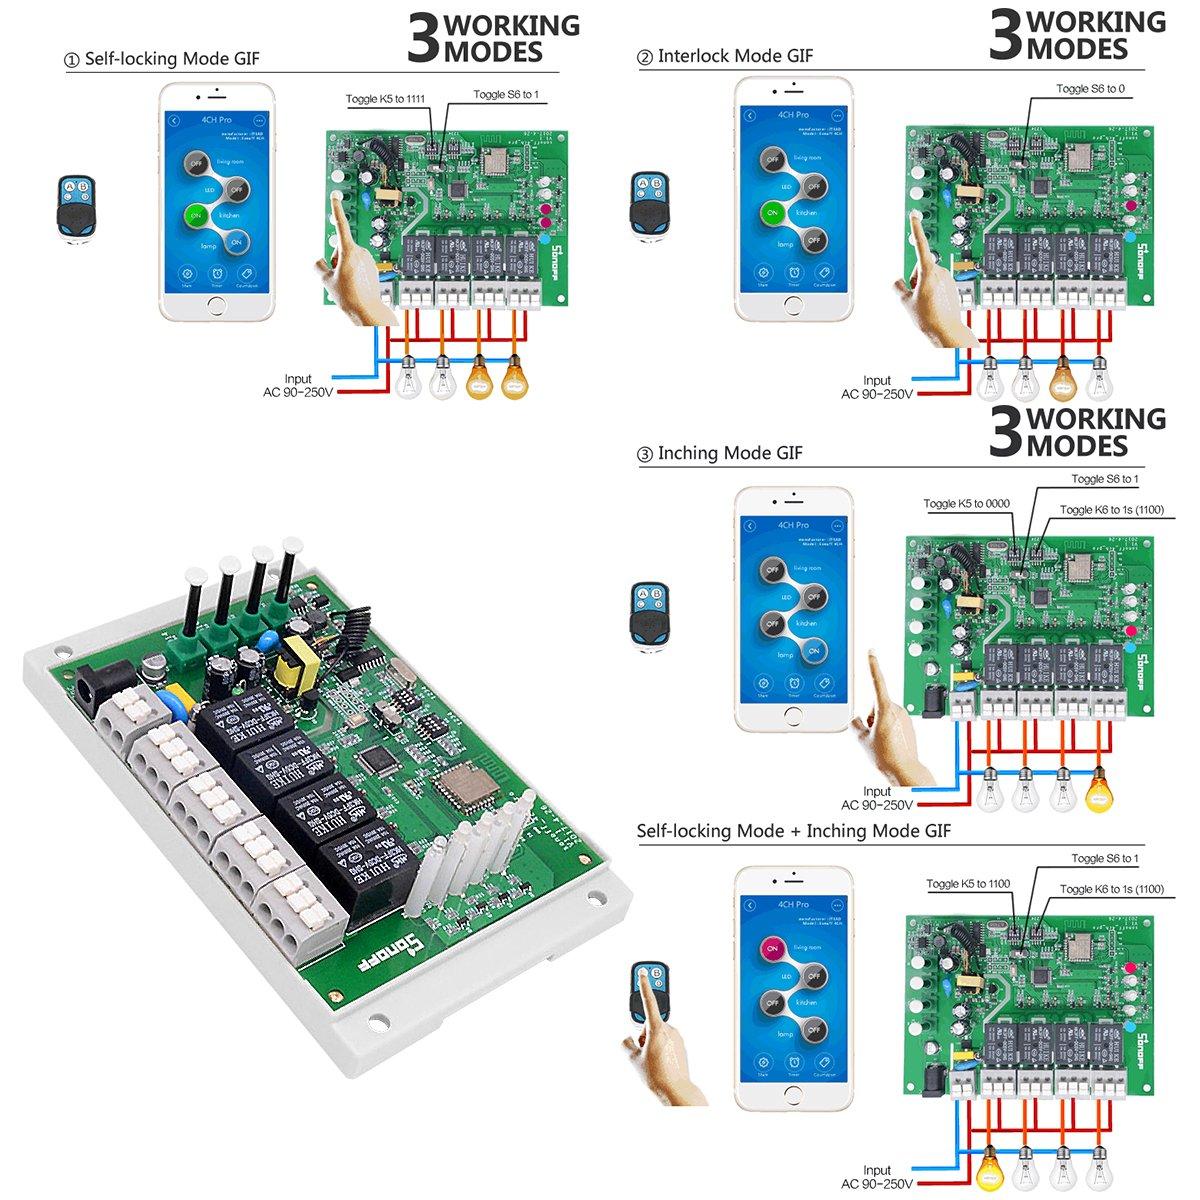 Elastisches Fingergriff Mobiltelefon Sonoff 4CH PRO R2 Smart Switch Home WiFi Funkfernbedienung Schalter 4 Kan/äle Smart Steckdose Kompatibel mit Alexa Google